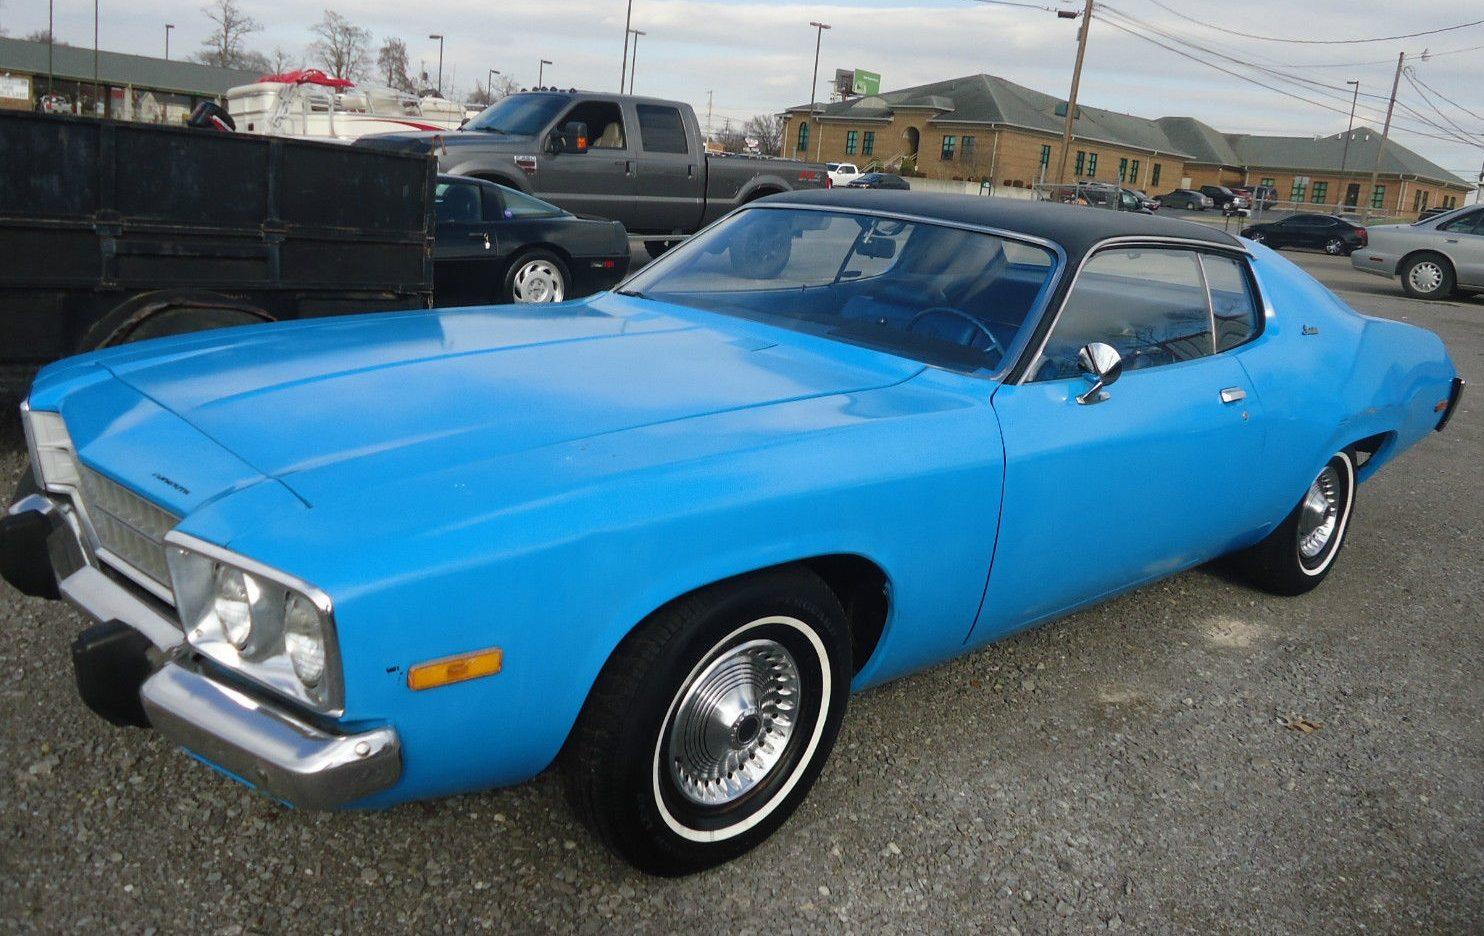 1 in addition 1973 Dodge Dart Sport in addition Marquez Design 1967 69 Firebird Door Panel also 25862 1973 chevrolet monte carlo landau 5   7l additionally Vision Quest Period Perfect 1971 Demon Built Kid Born 20 Years Late. on 73 dodge dart interior